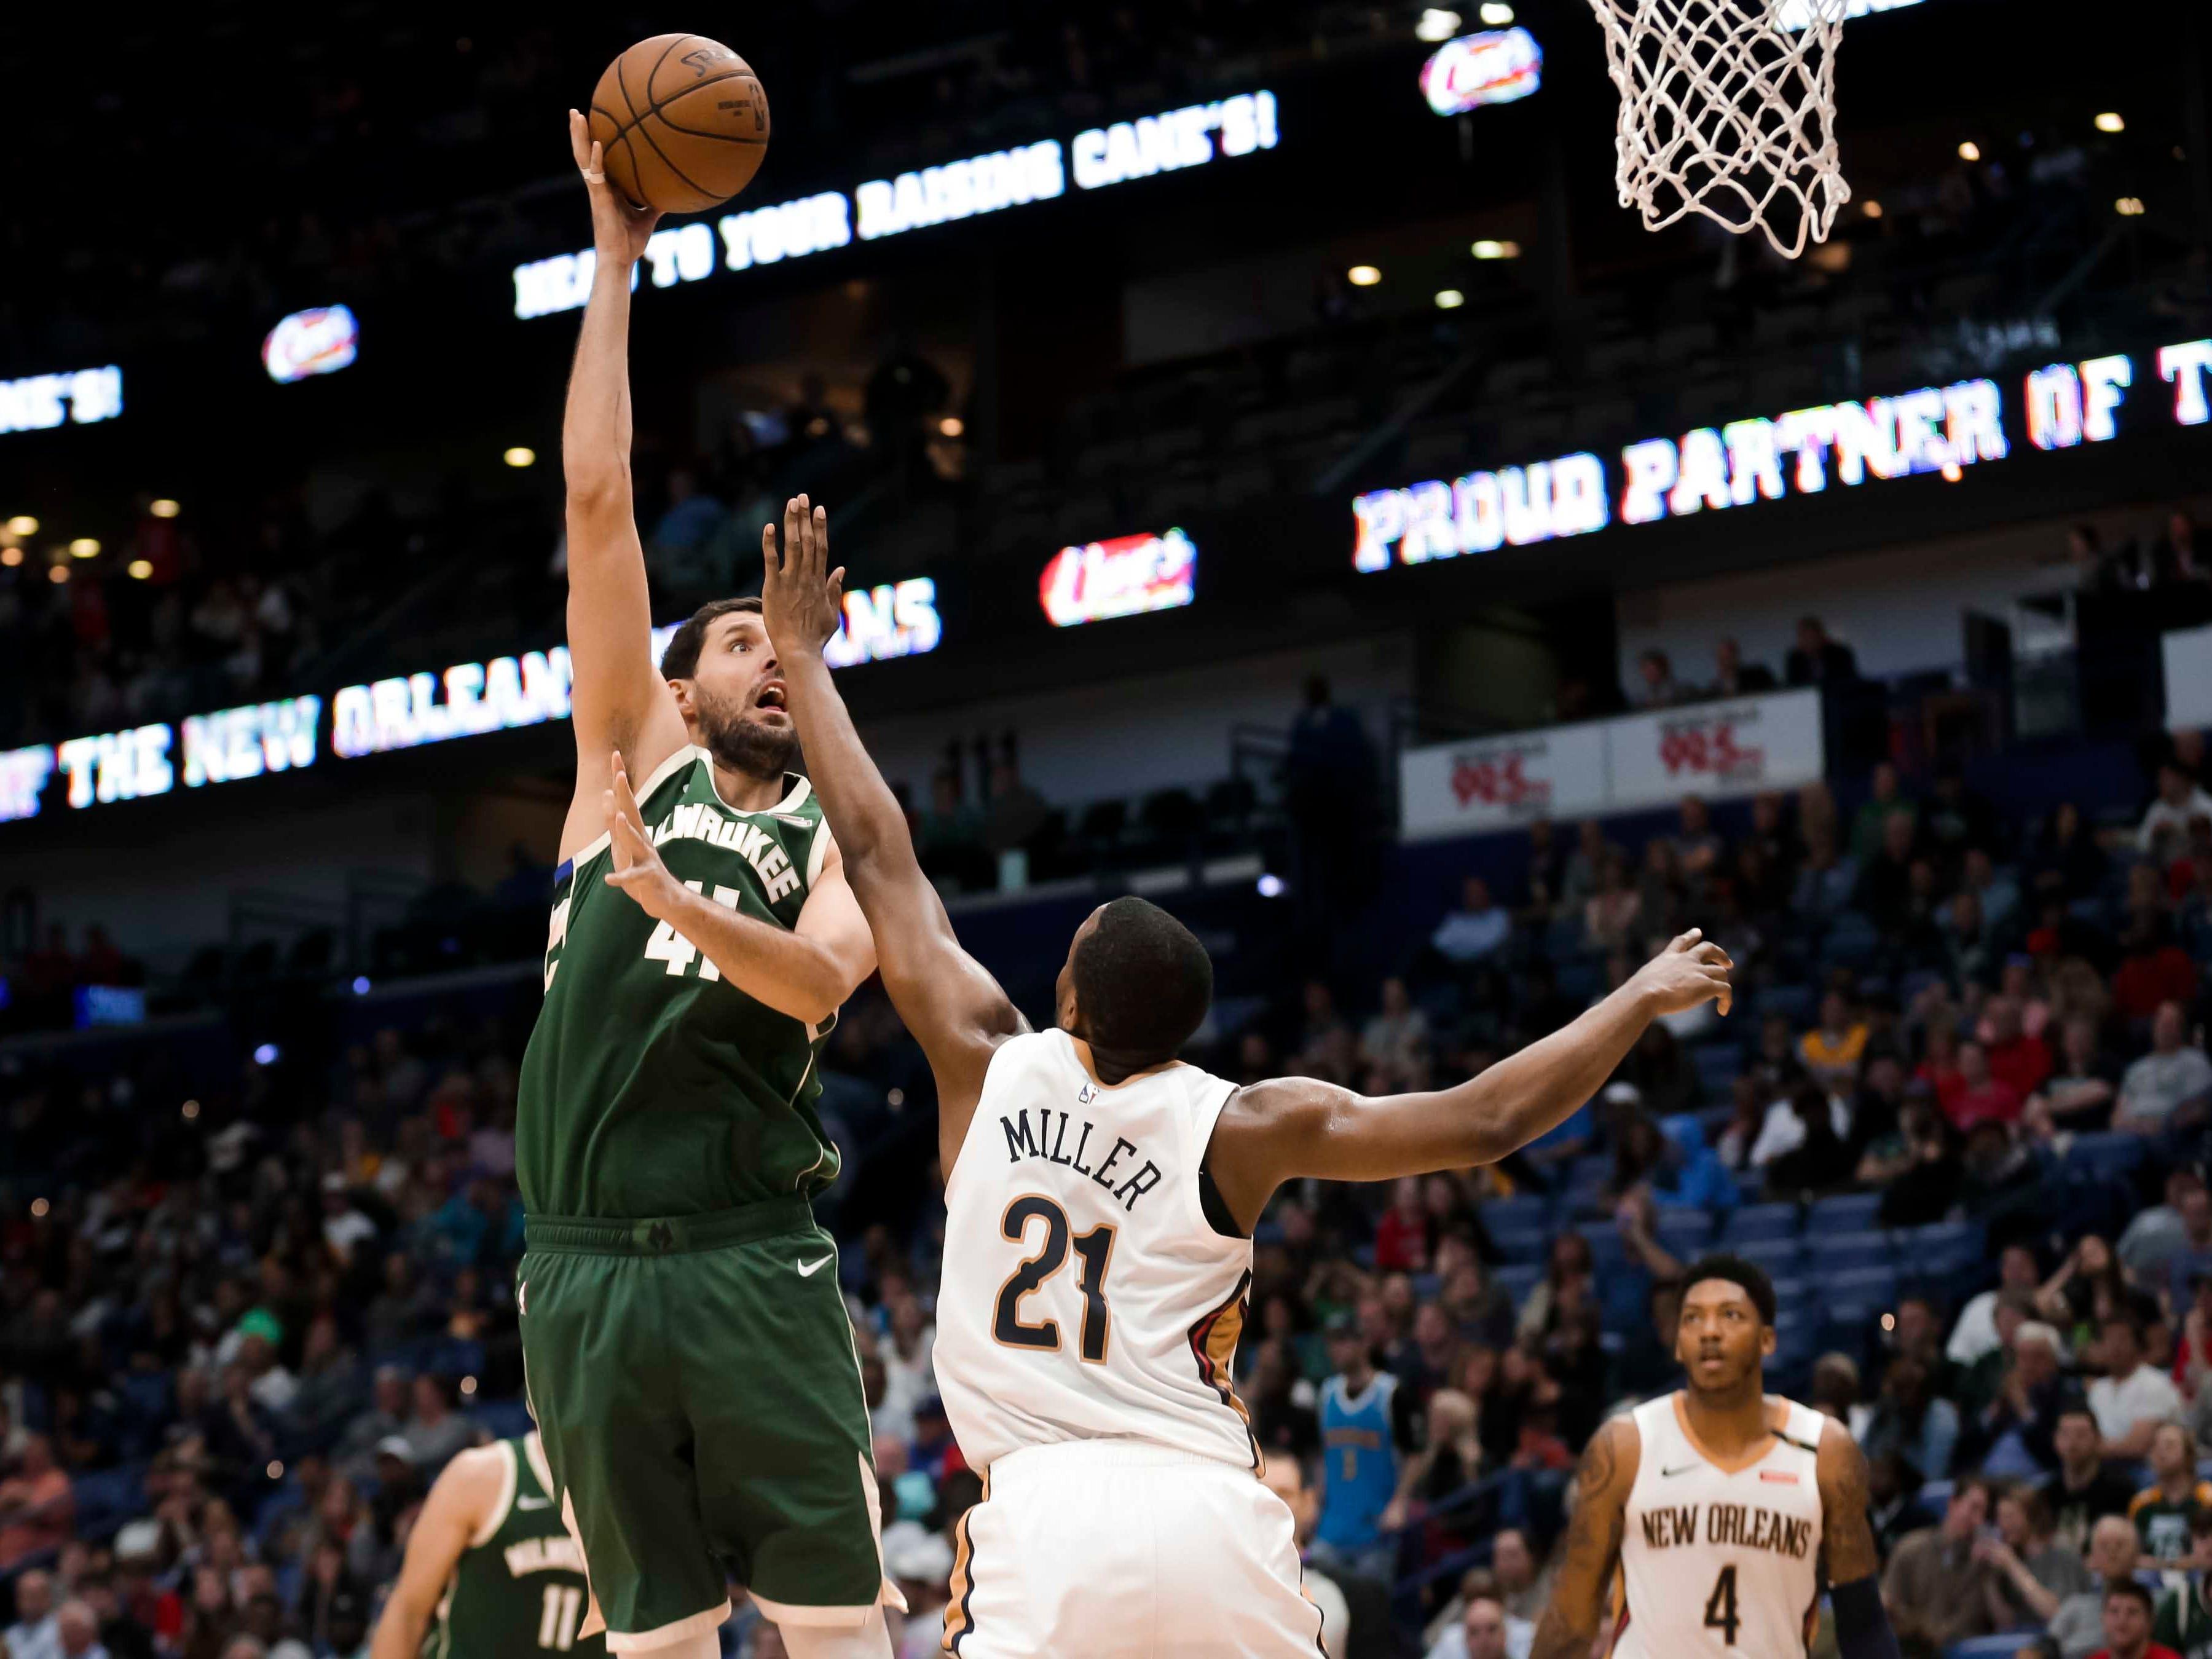 Bucks forward Nikola Mirotic puts up a hook shot over Pelicans forward Darius Miller during the second half.